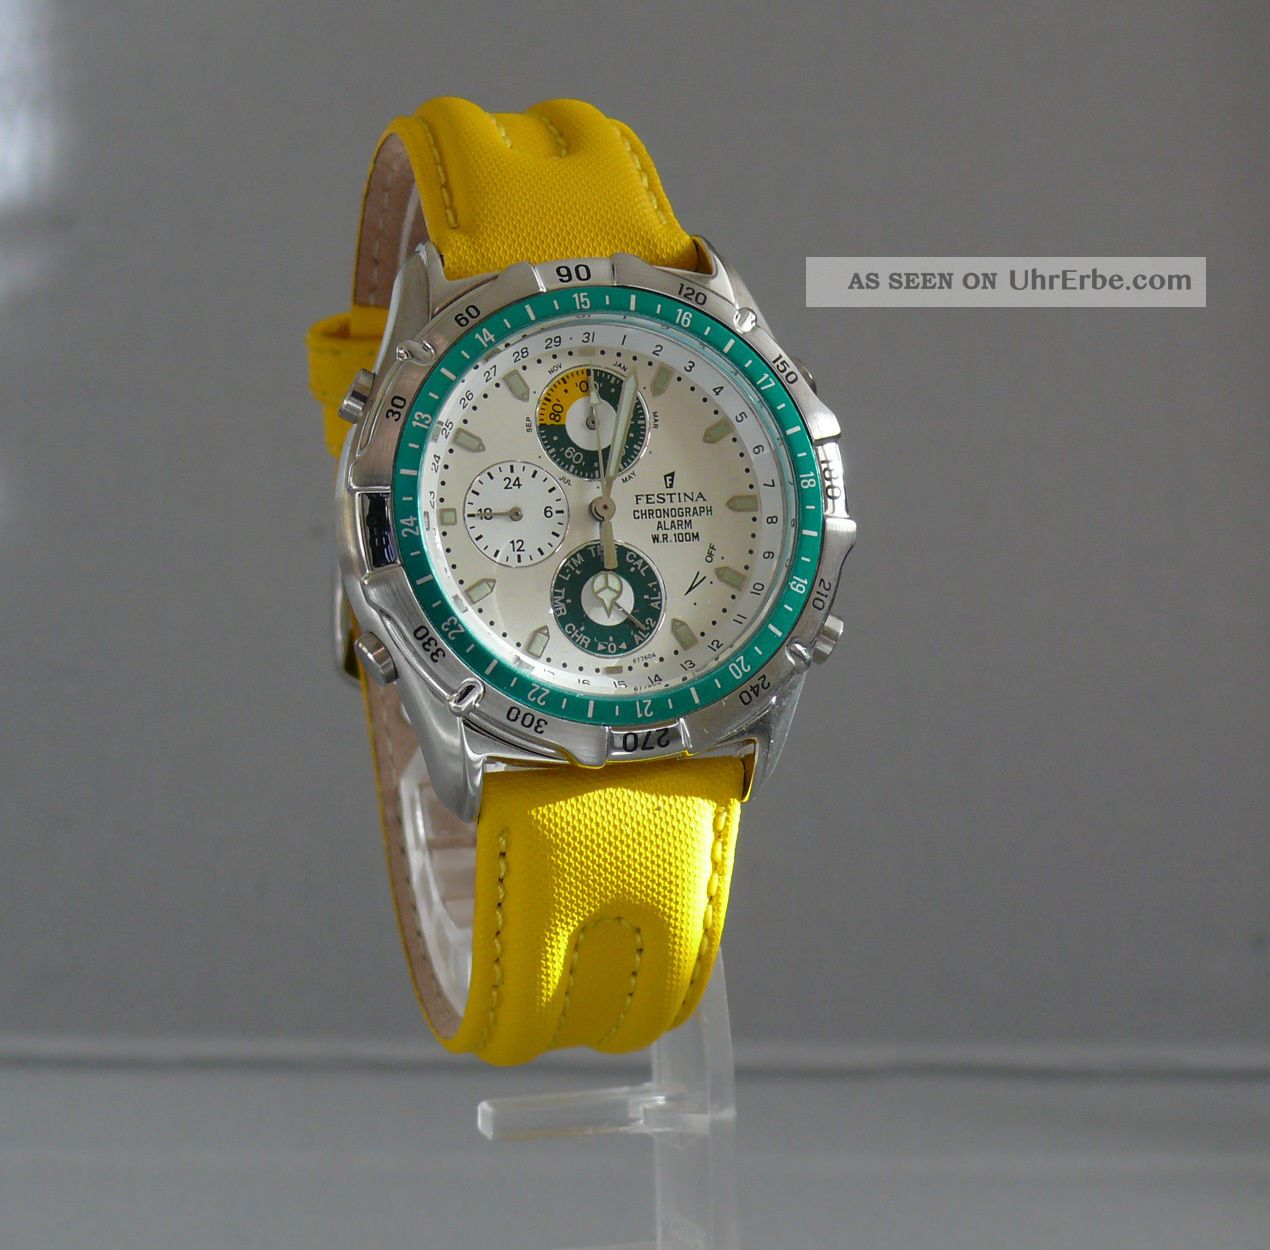 Festina Quarzchronograph Edelstahl Mit Weckfunktion (2.  Ur002 - 446) Armbanduhren Bild